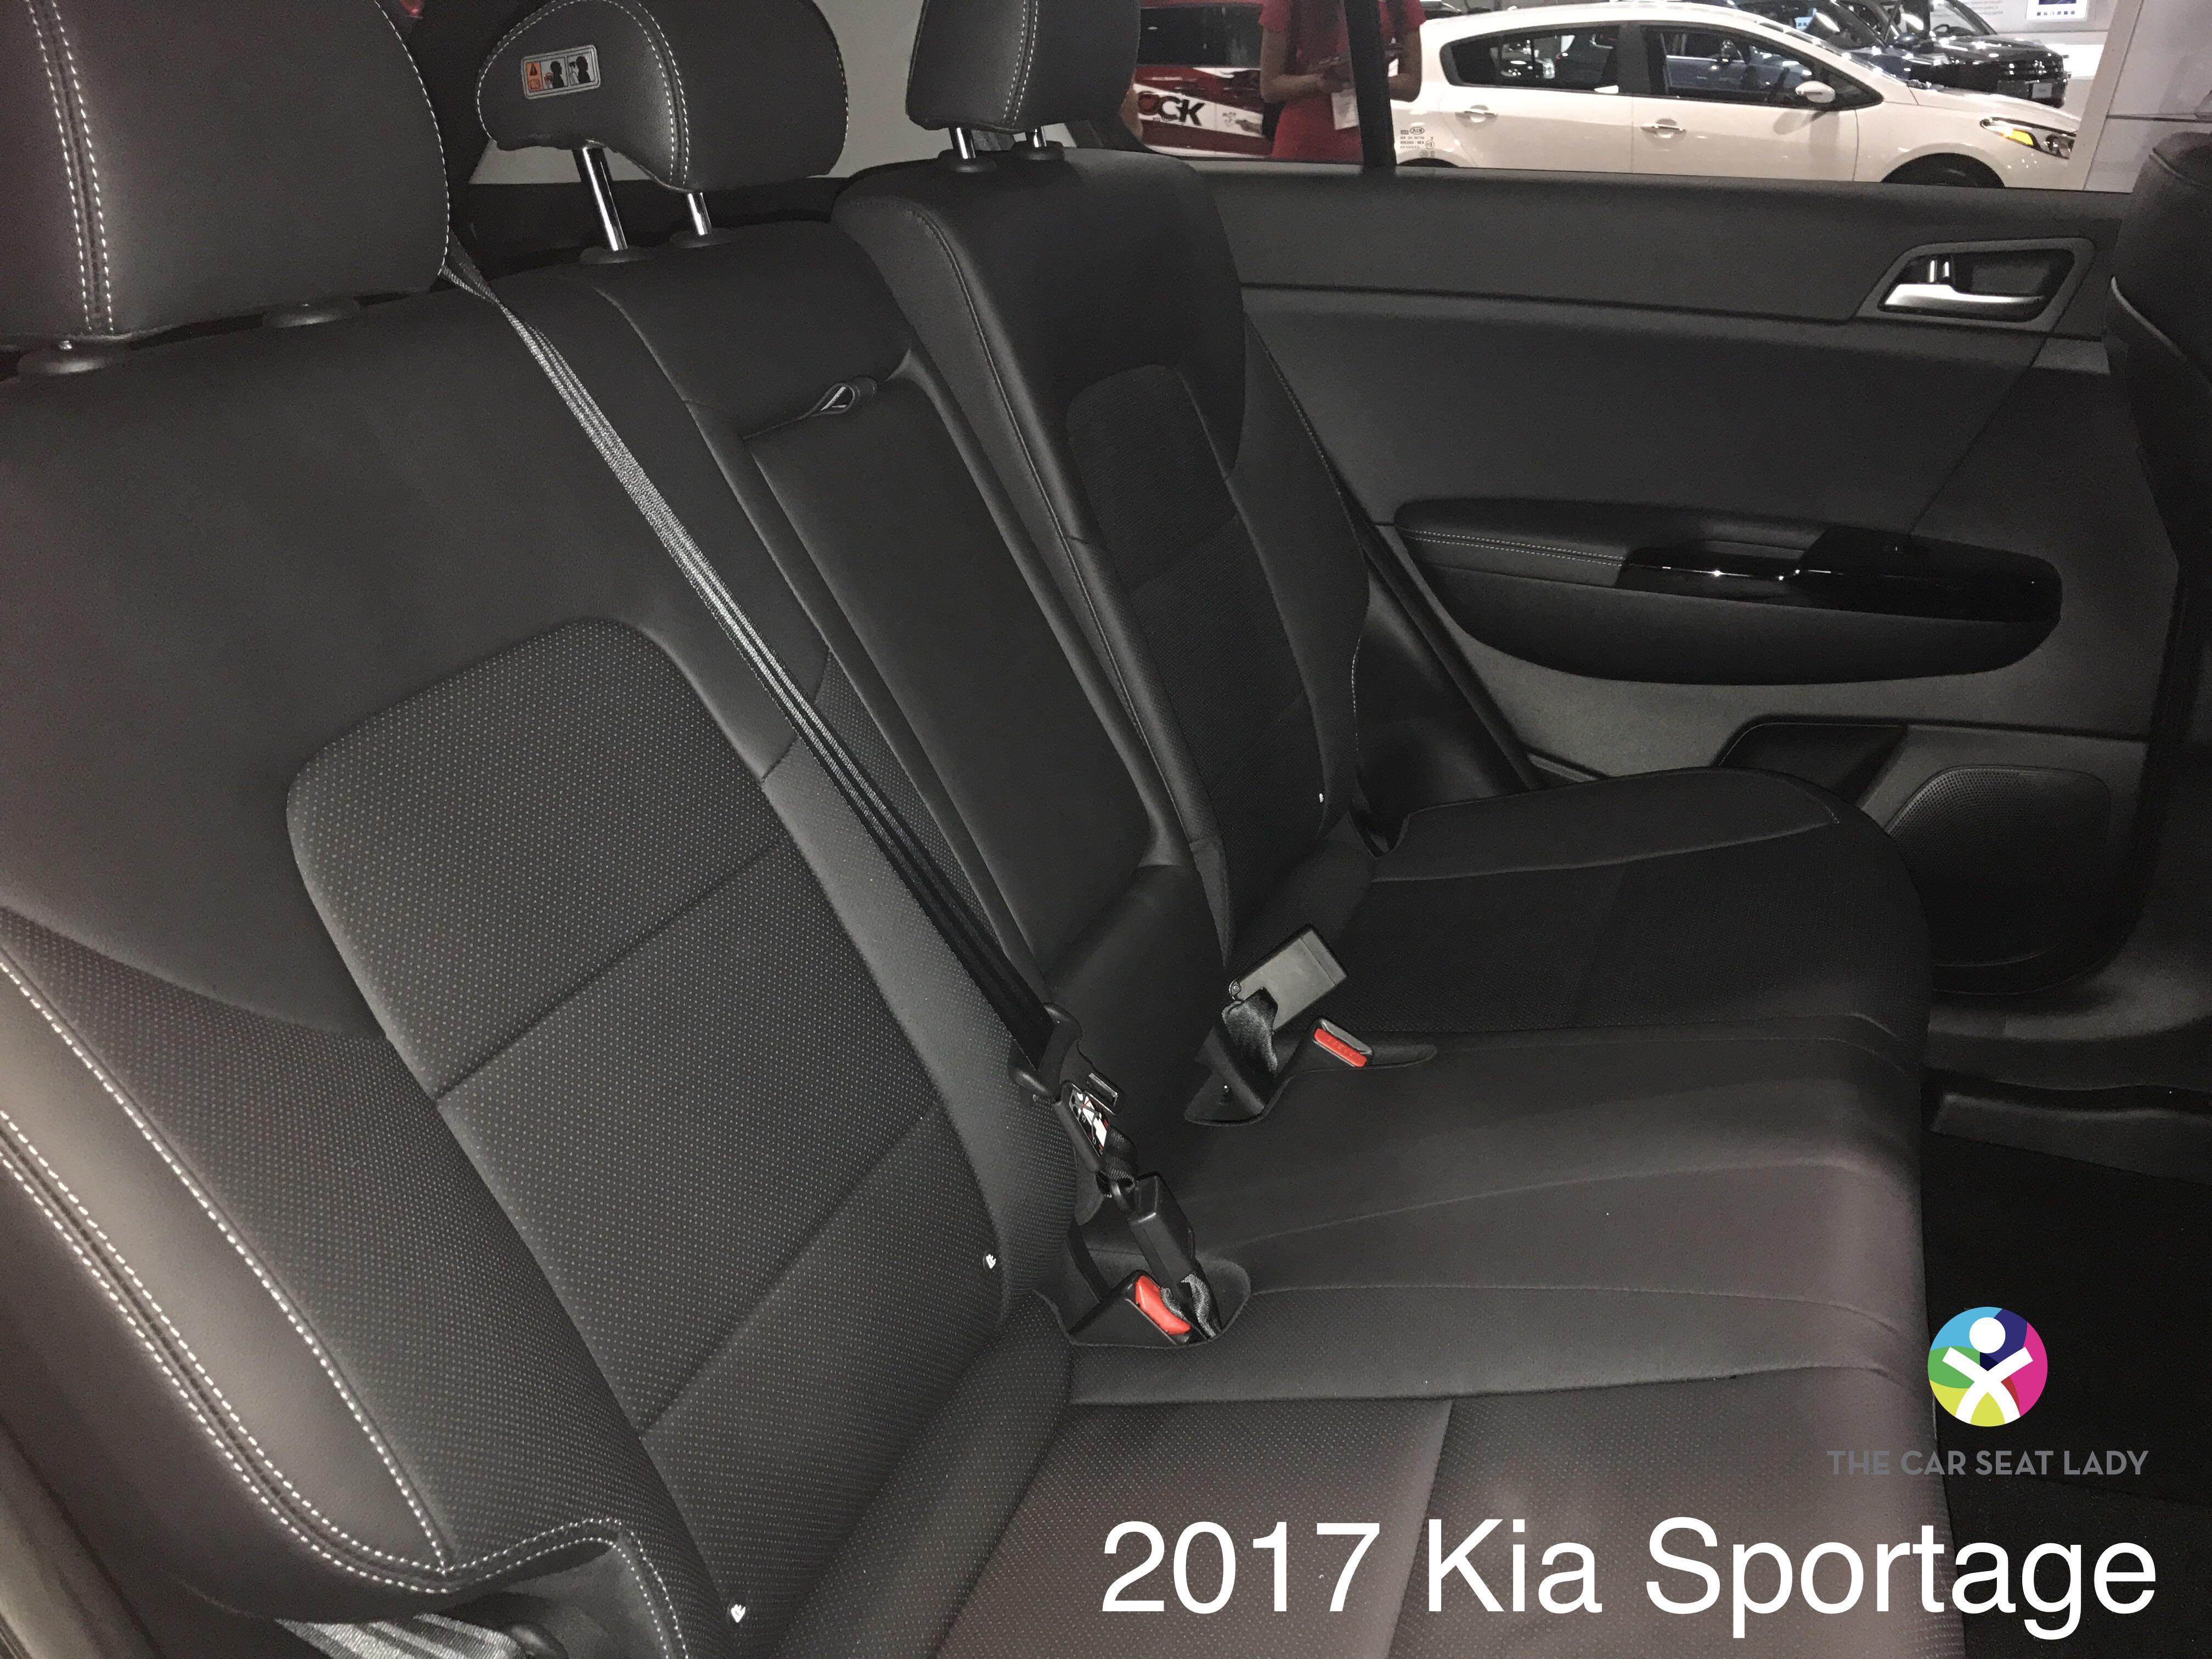 2017 2016 Kia Sportage